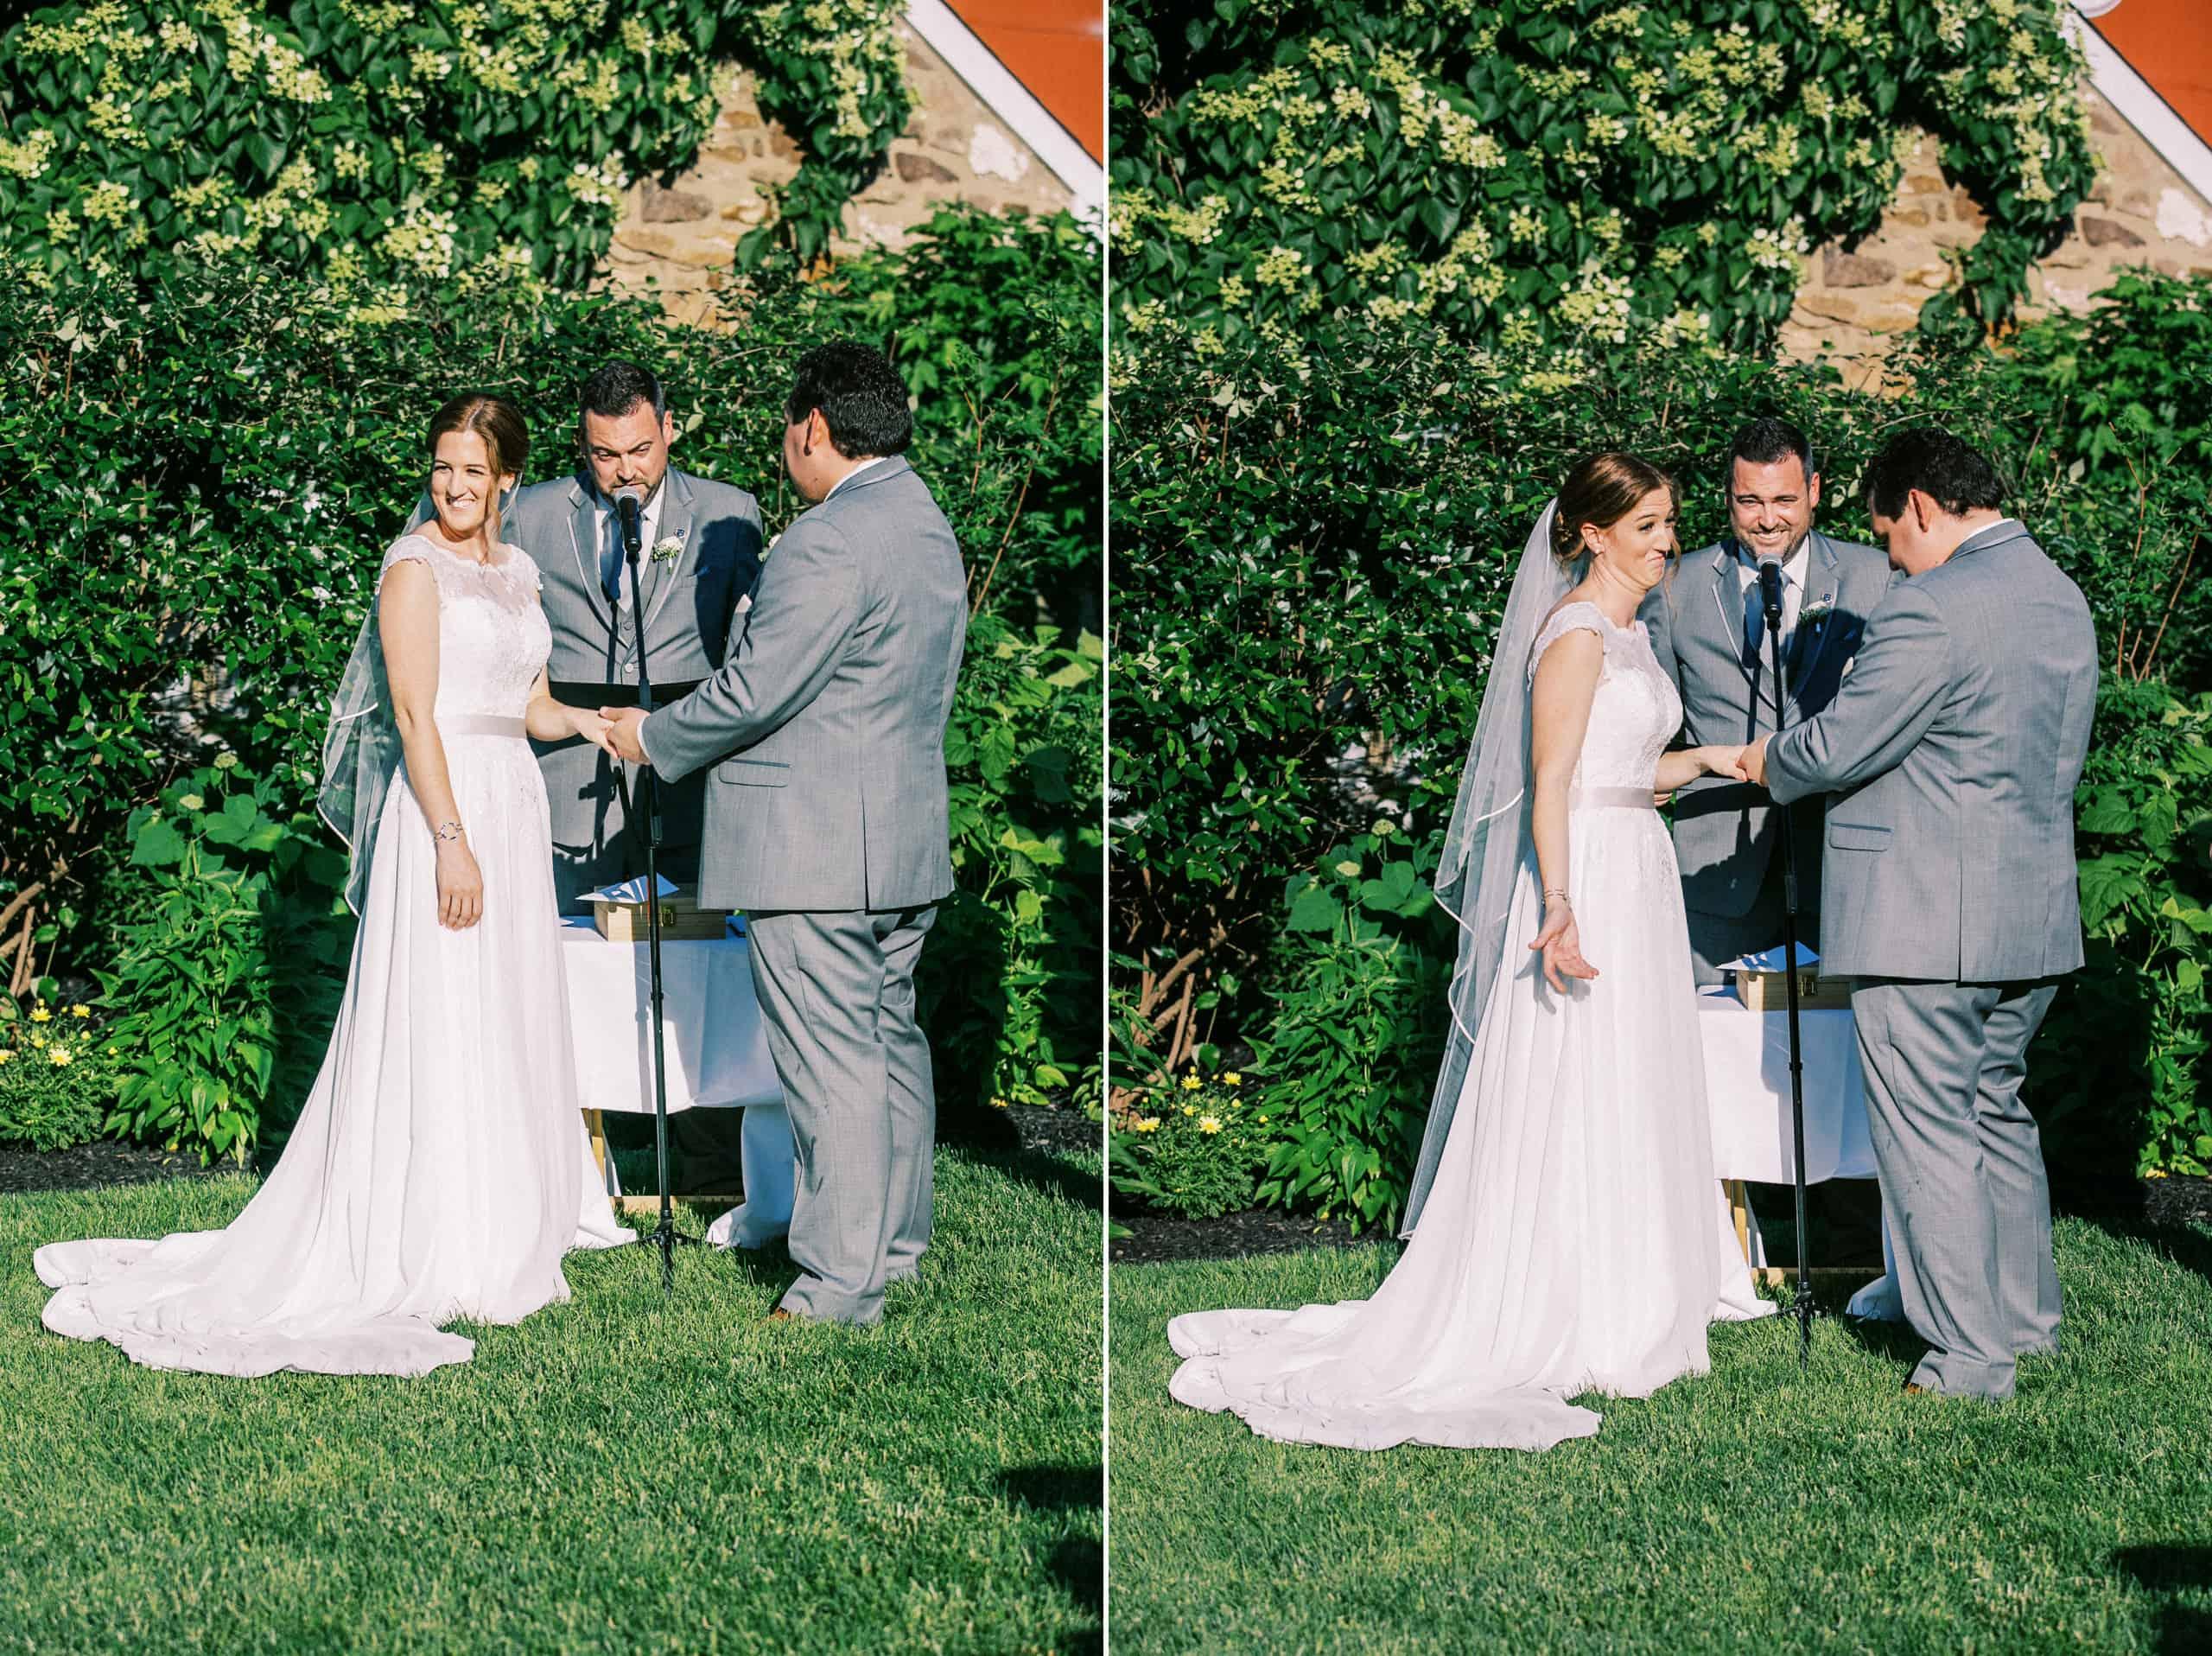 Old York Road wedding ceremony